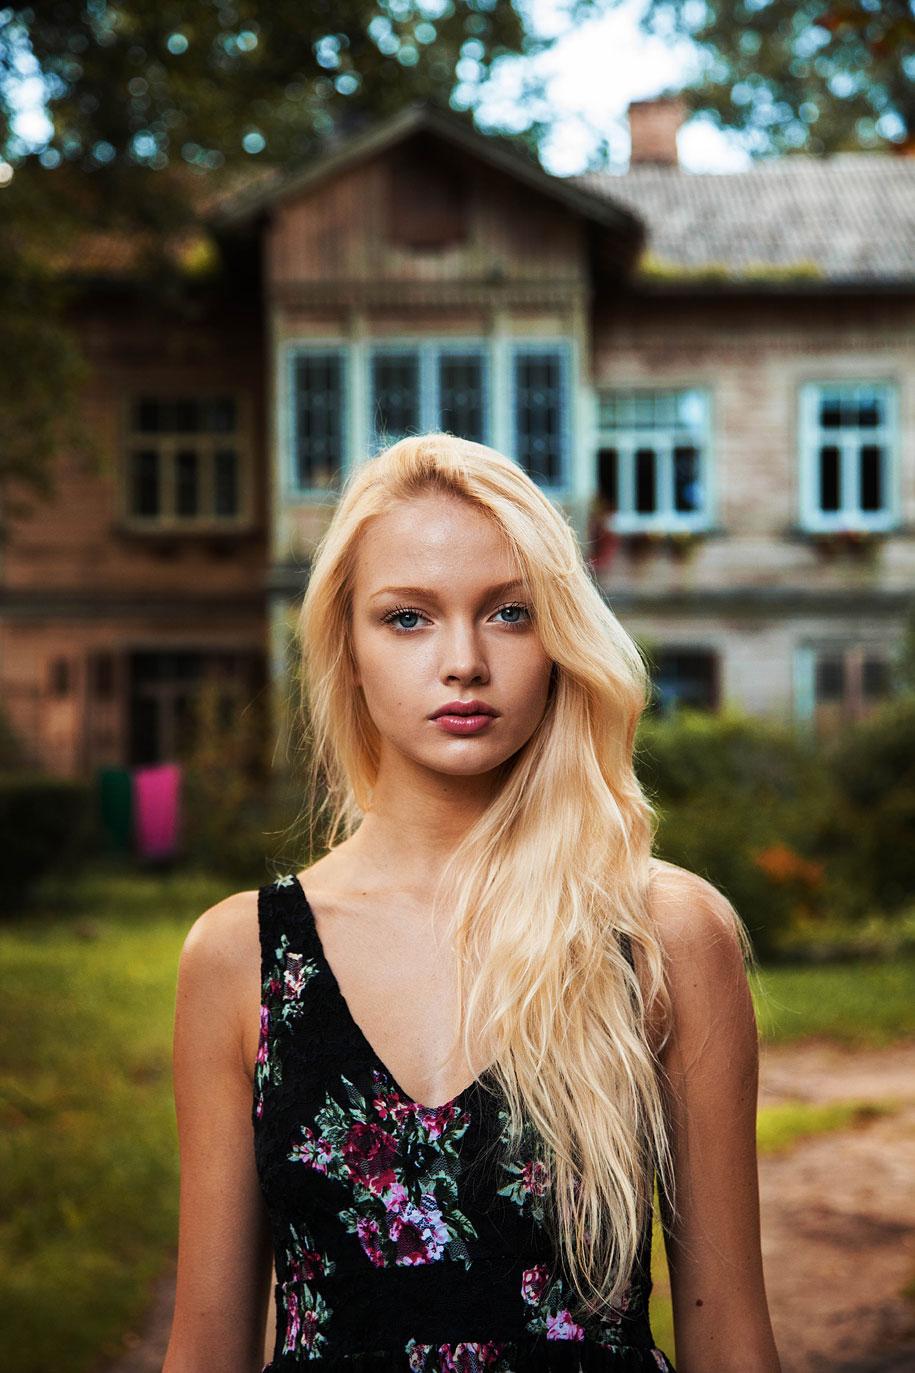 latvia woman by mihaela noroc